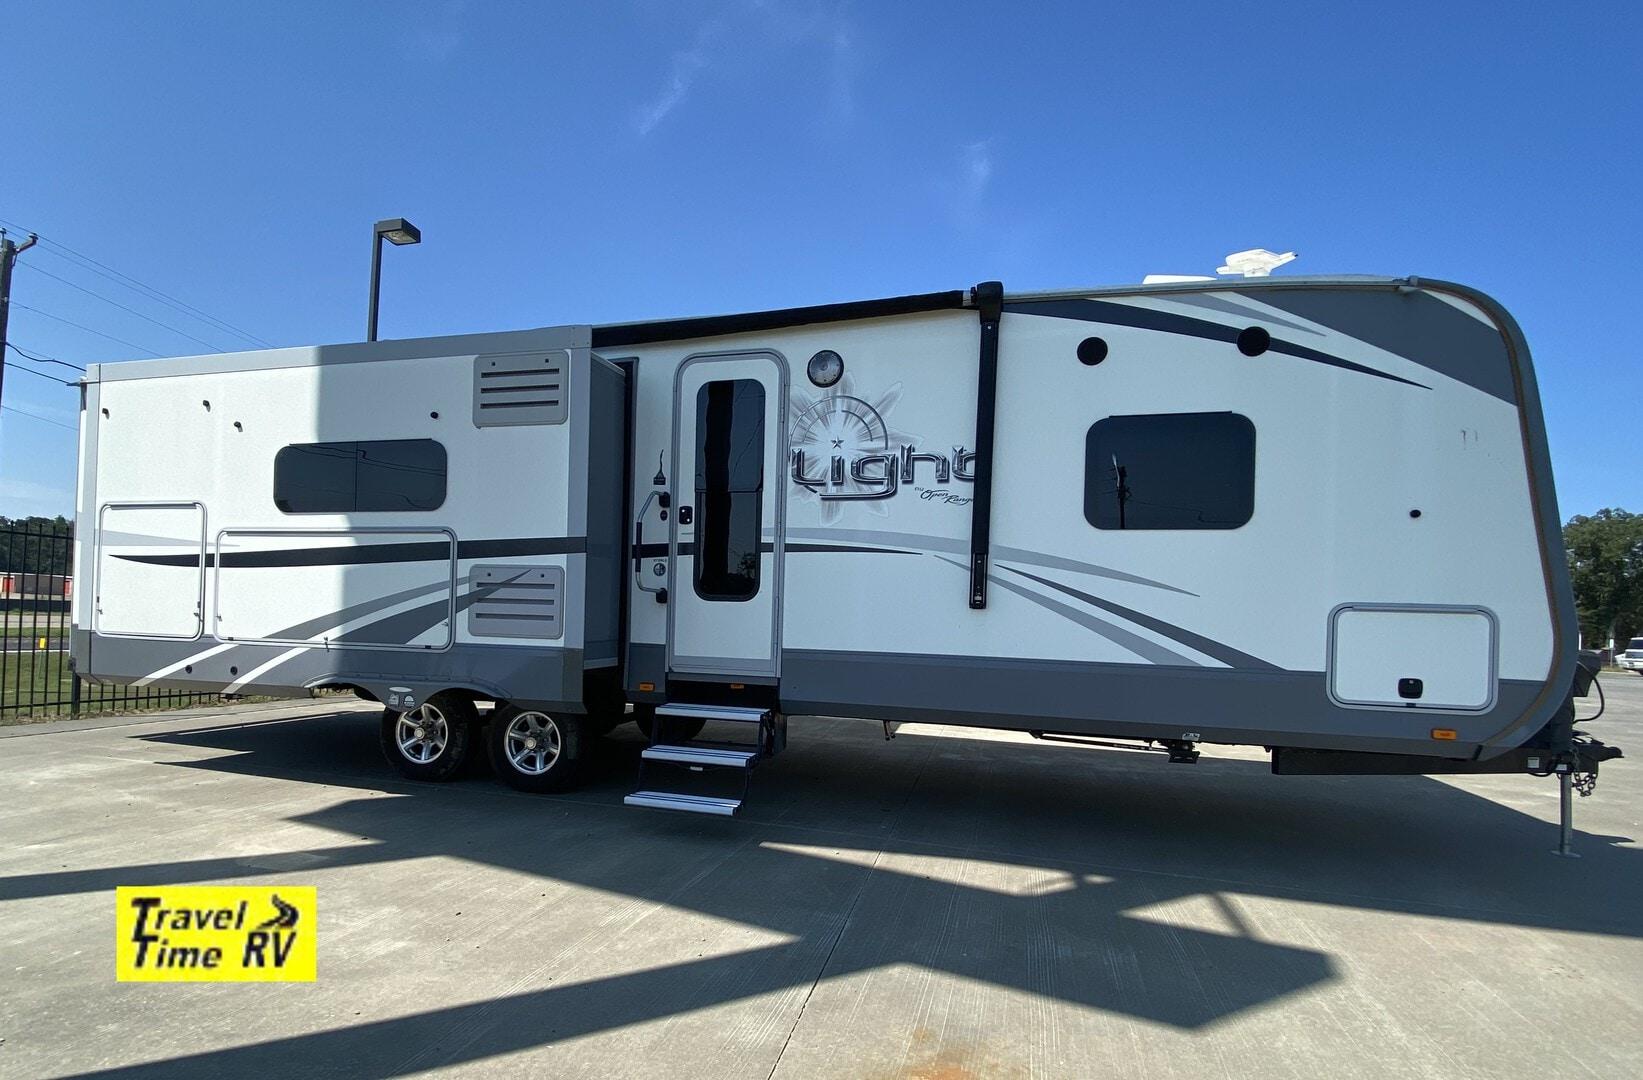 Used, 2017, Highland Ridge, Open Range Light LT272RLS, Travel Trailers